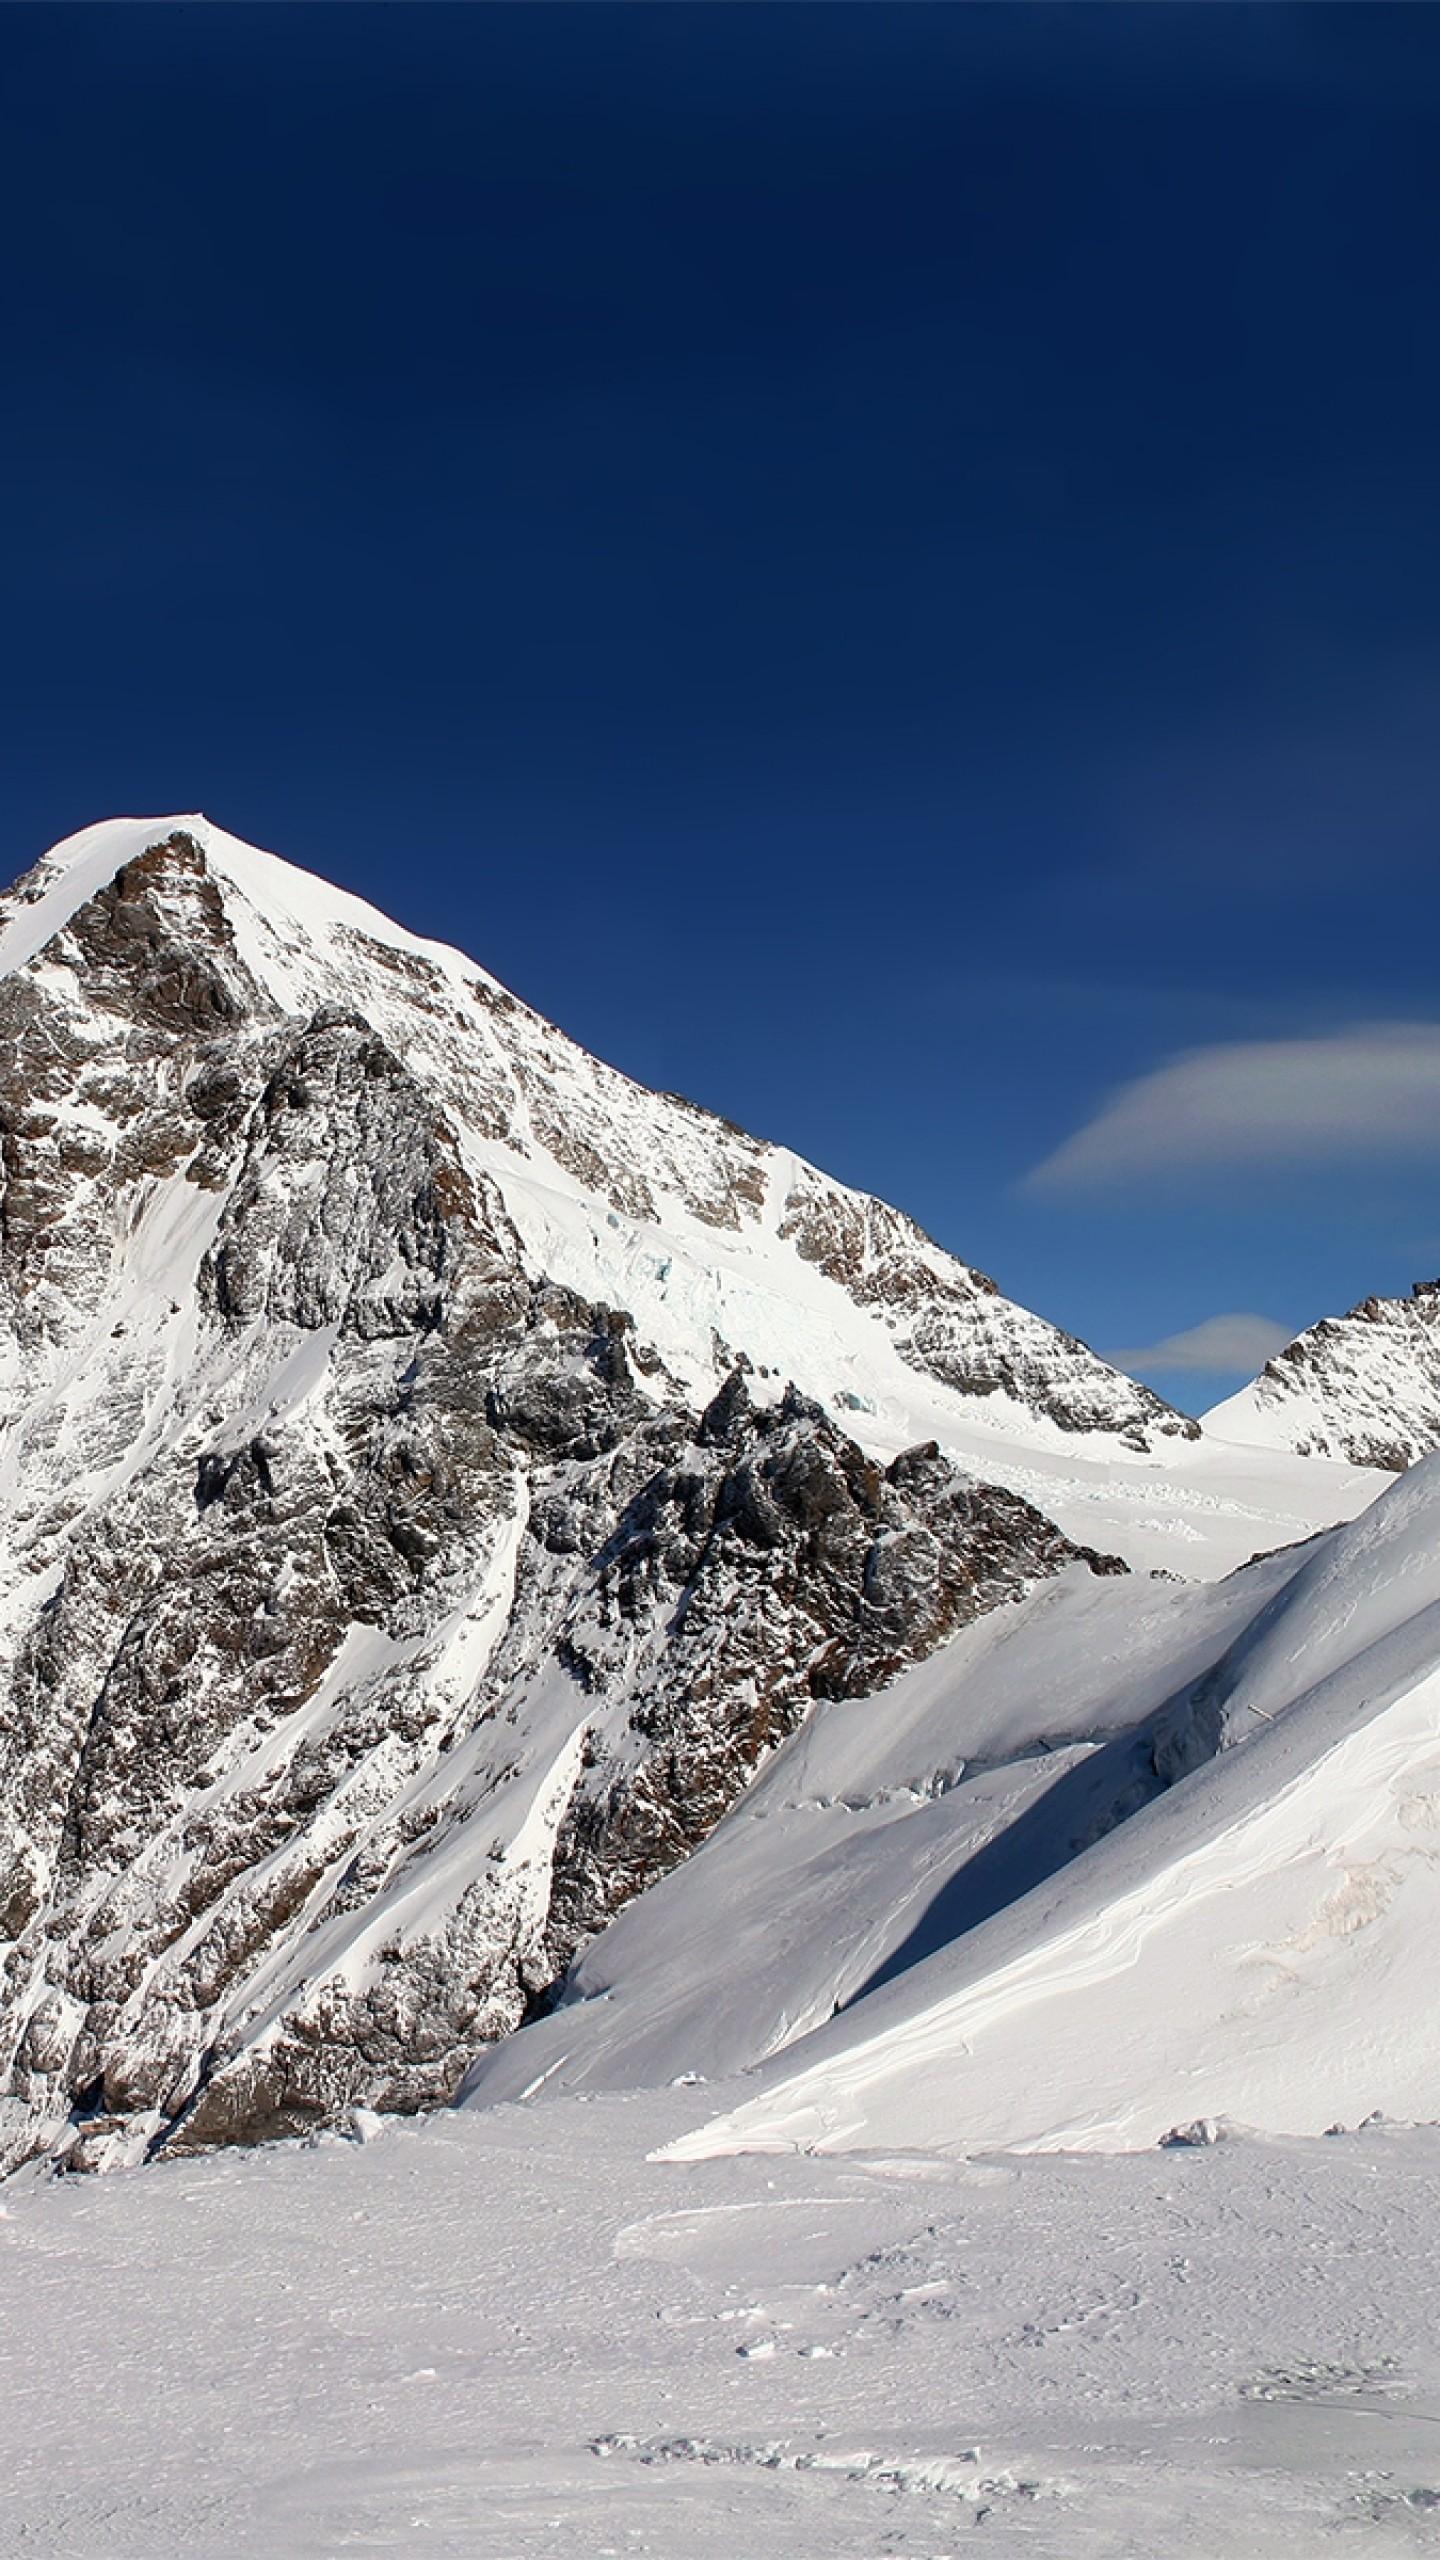 Wallpaper mountain, snow, lines, geometry, winter